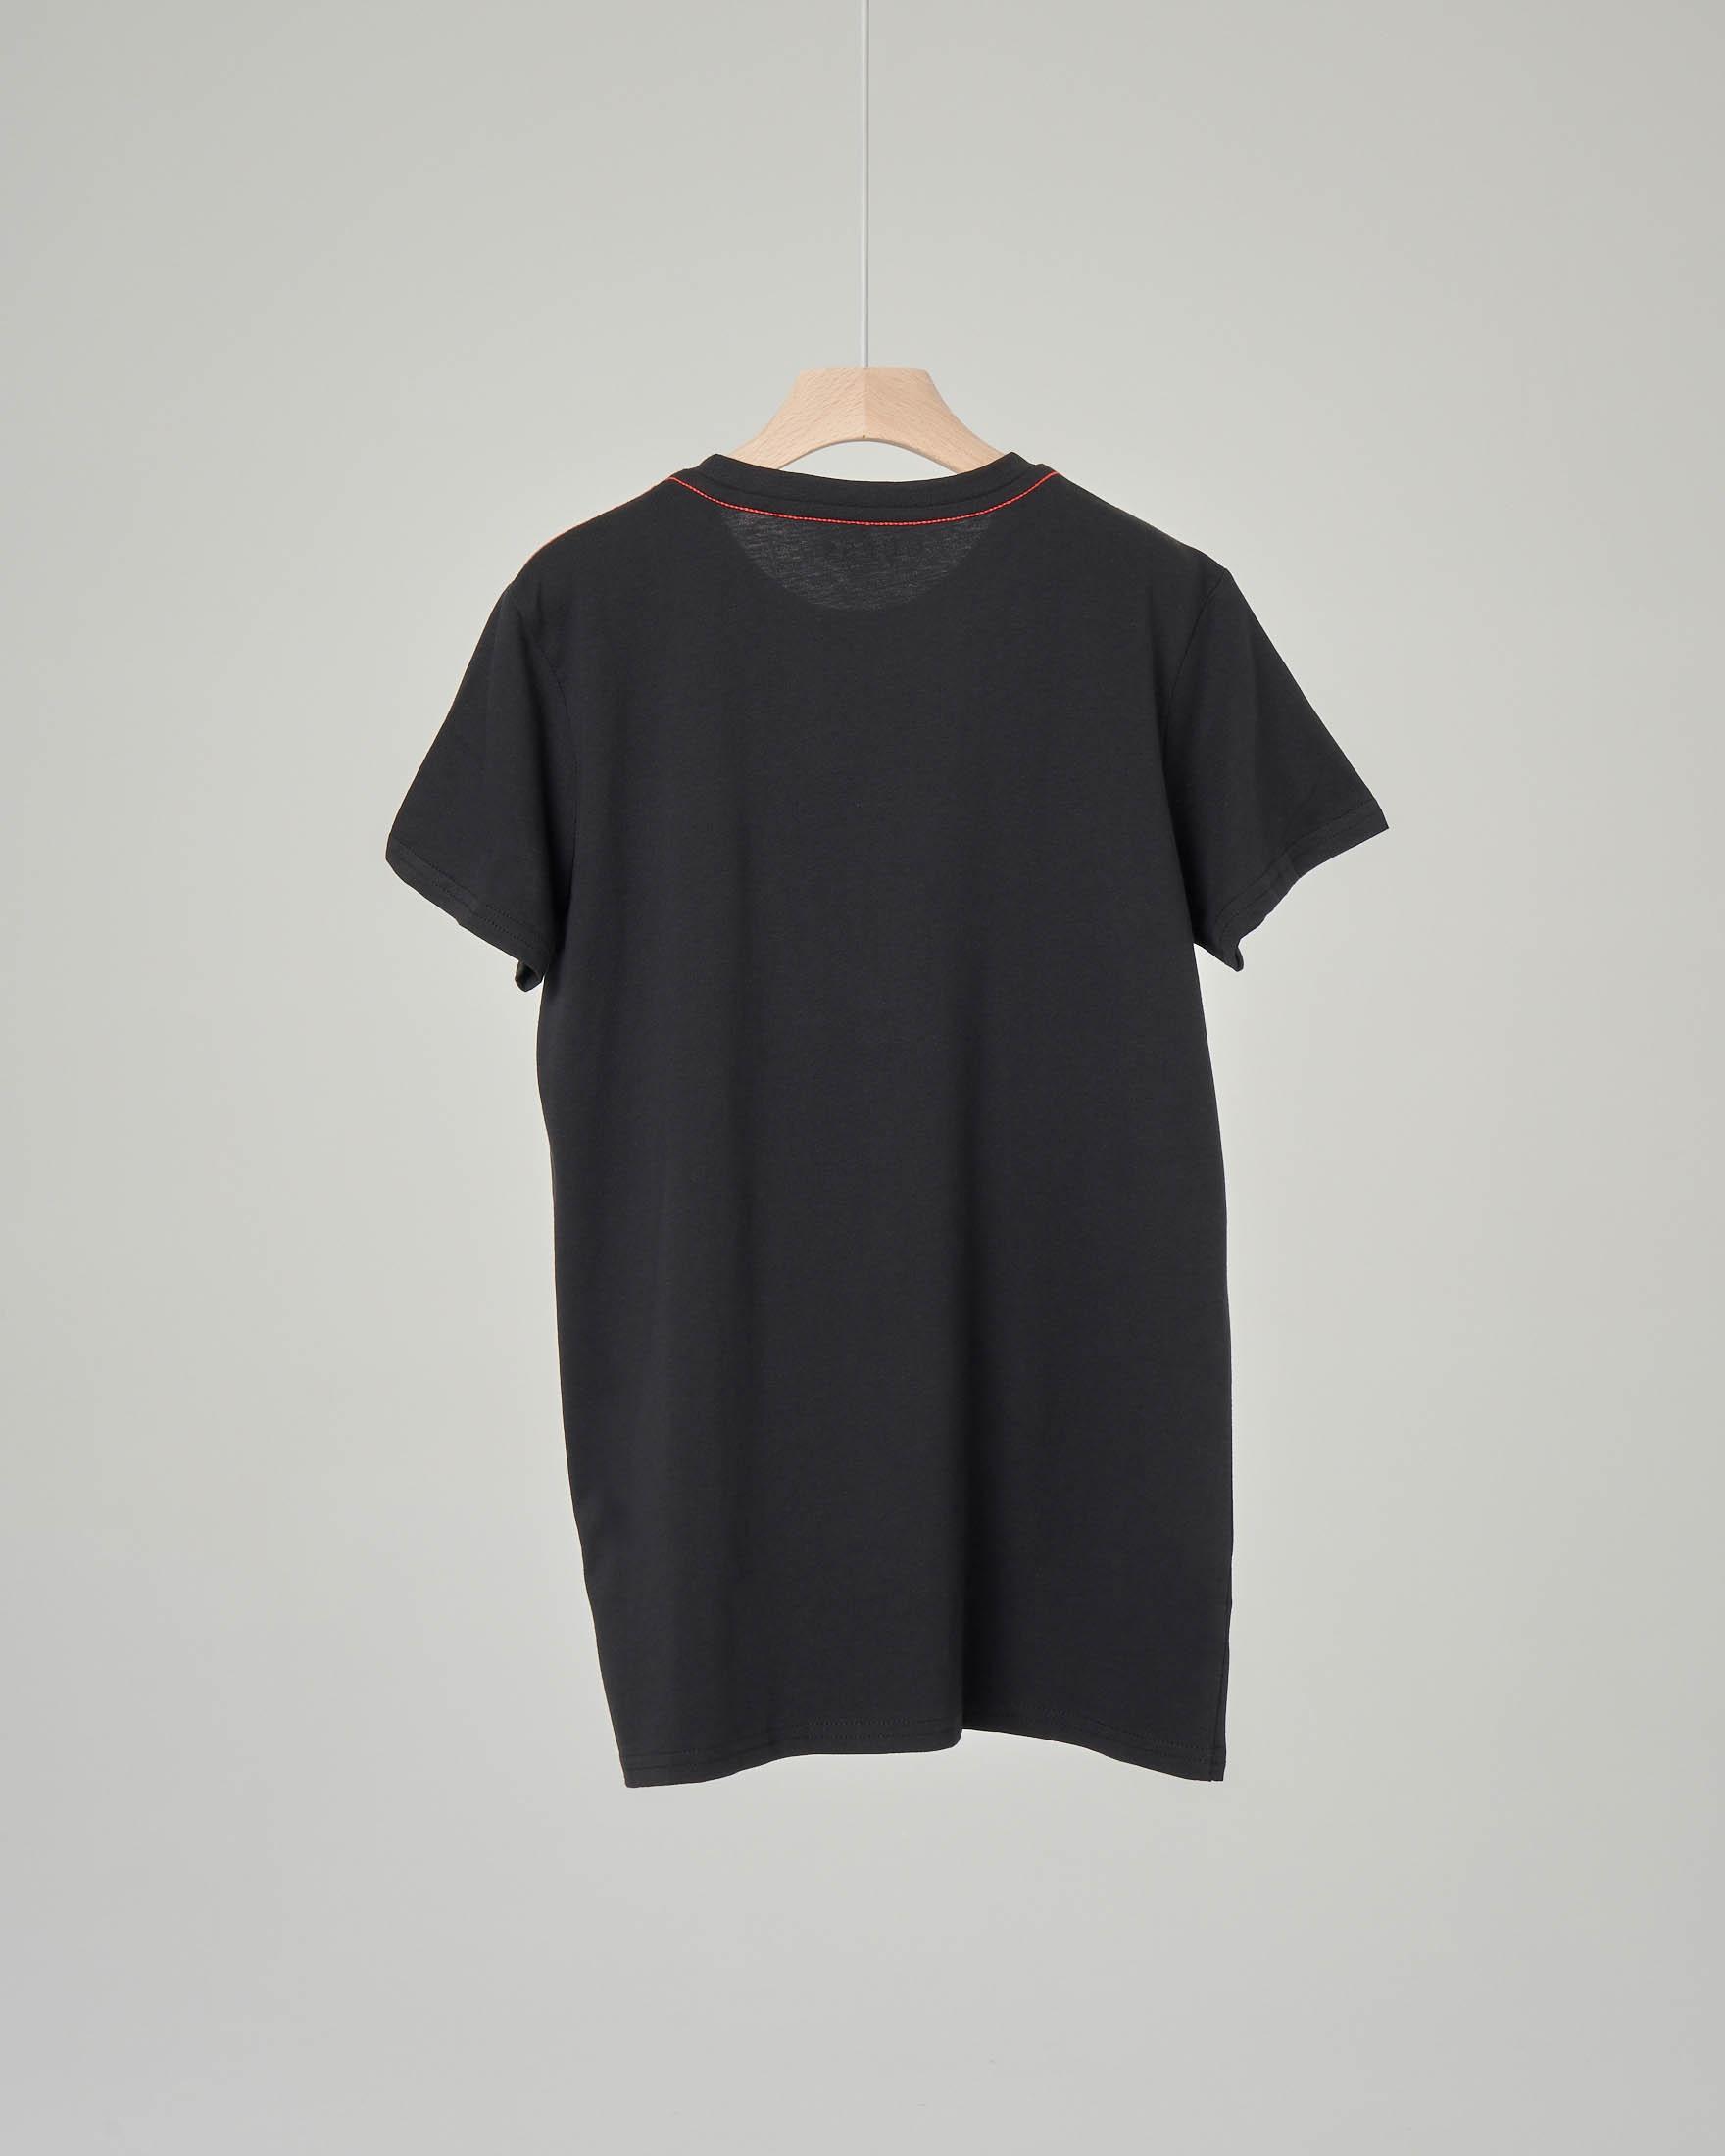 T-shirt nera con maxi-logo triangolo